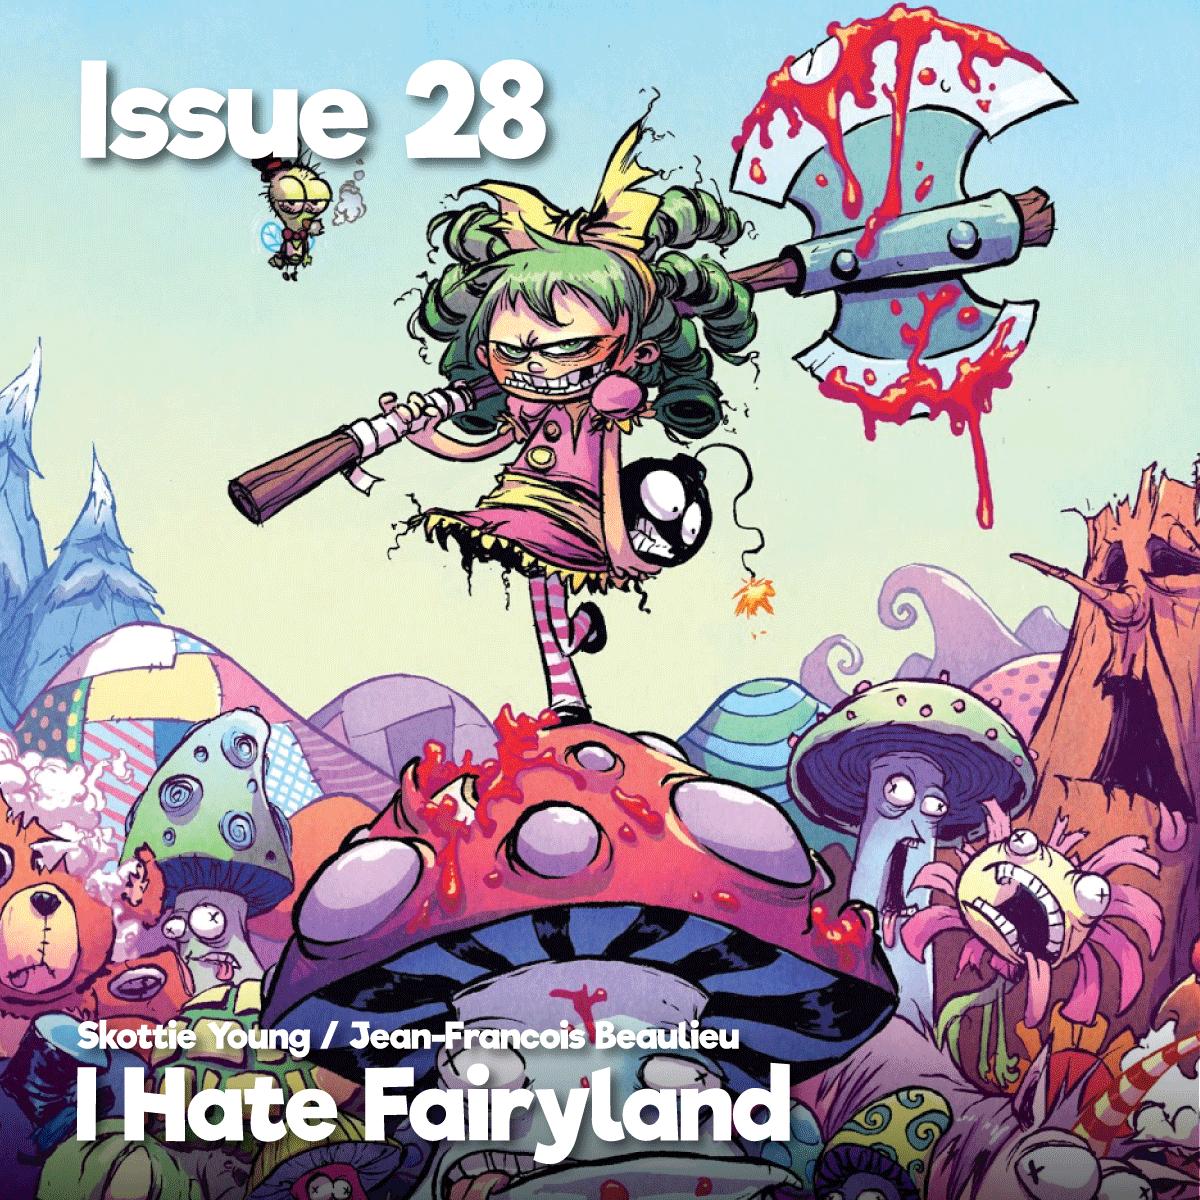 Issue28_IHateFairyland_1200x1200.png